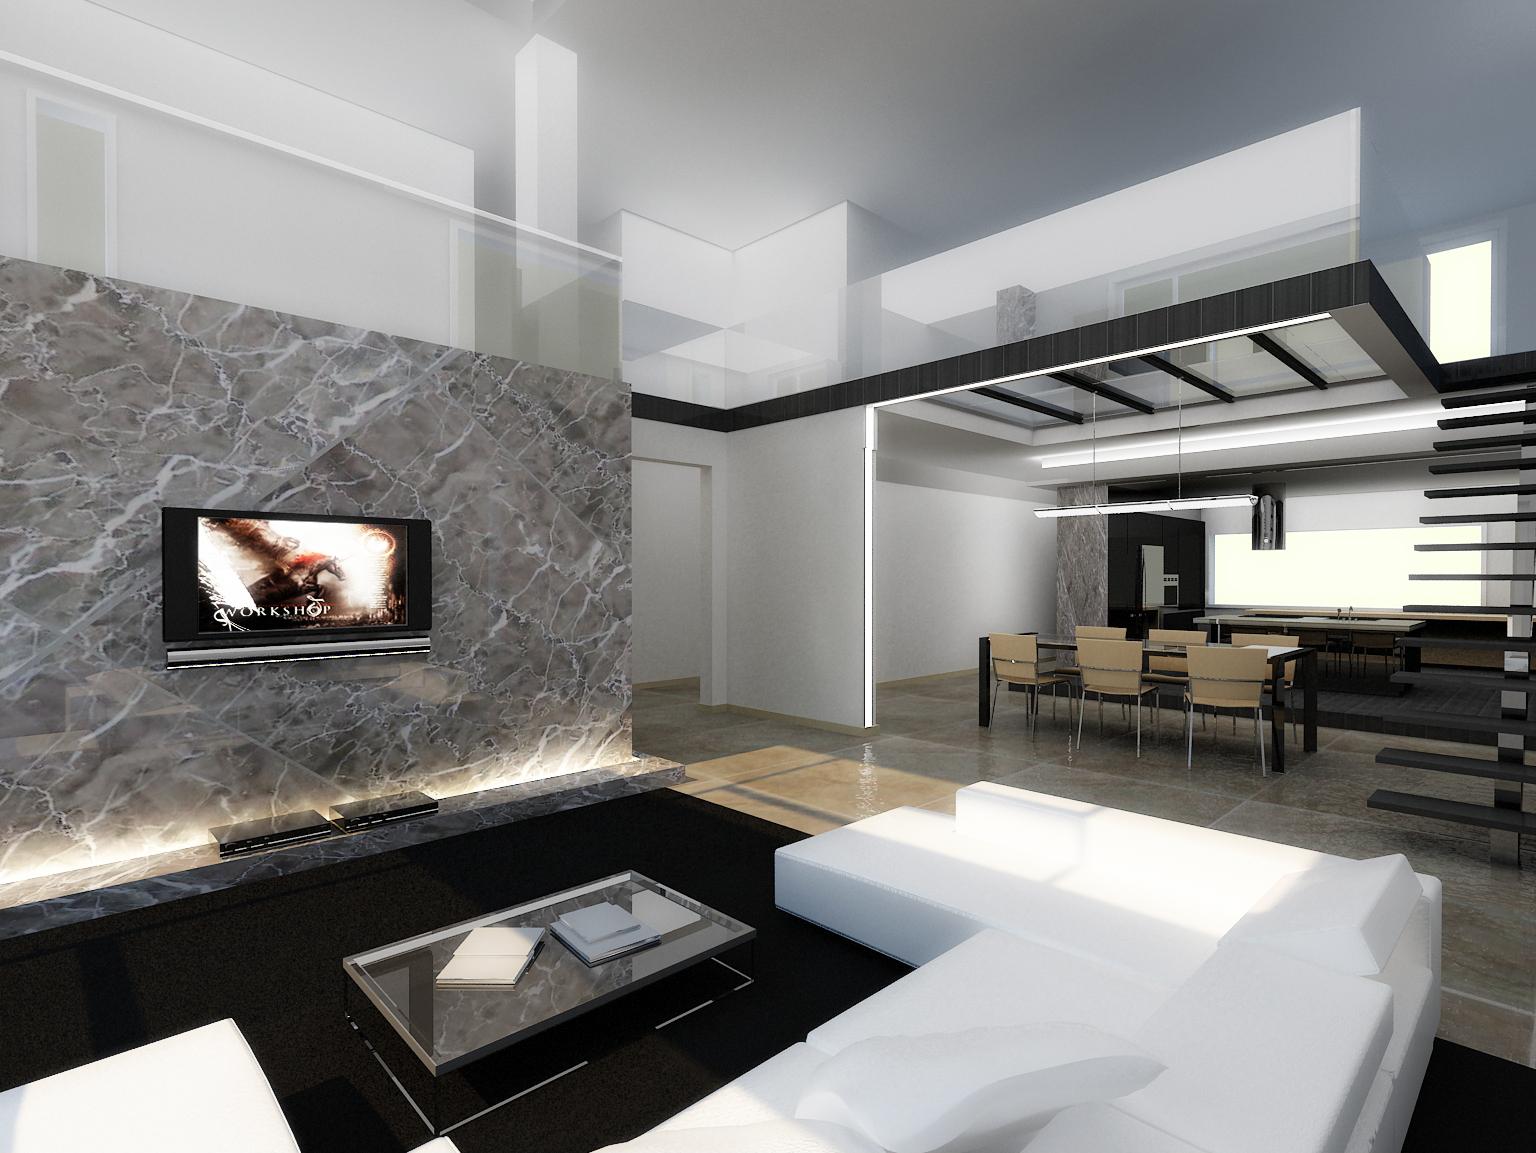 modern interior by longbow0508 on DeviantArt